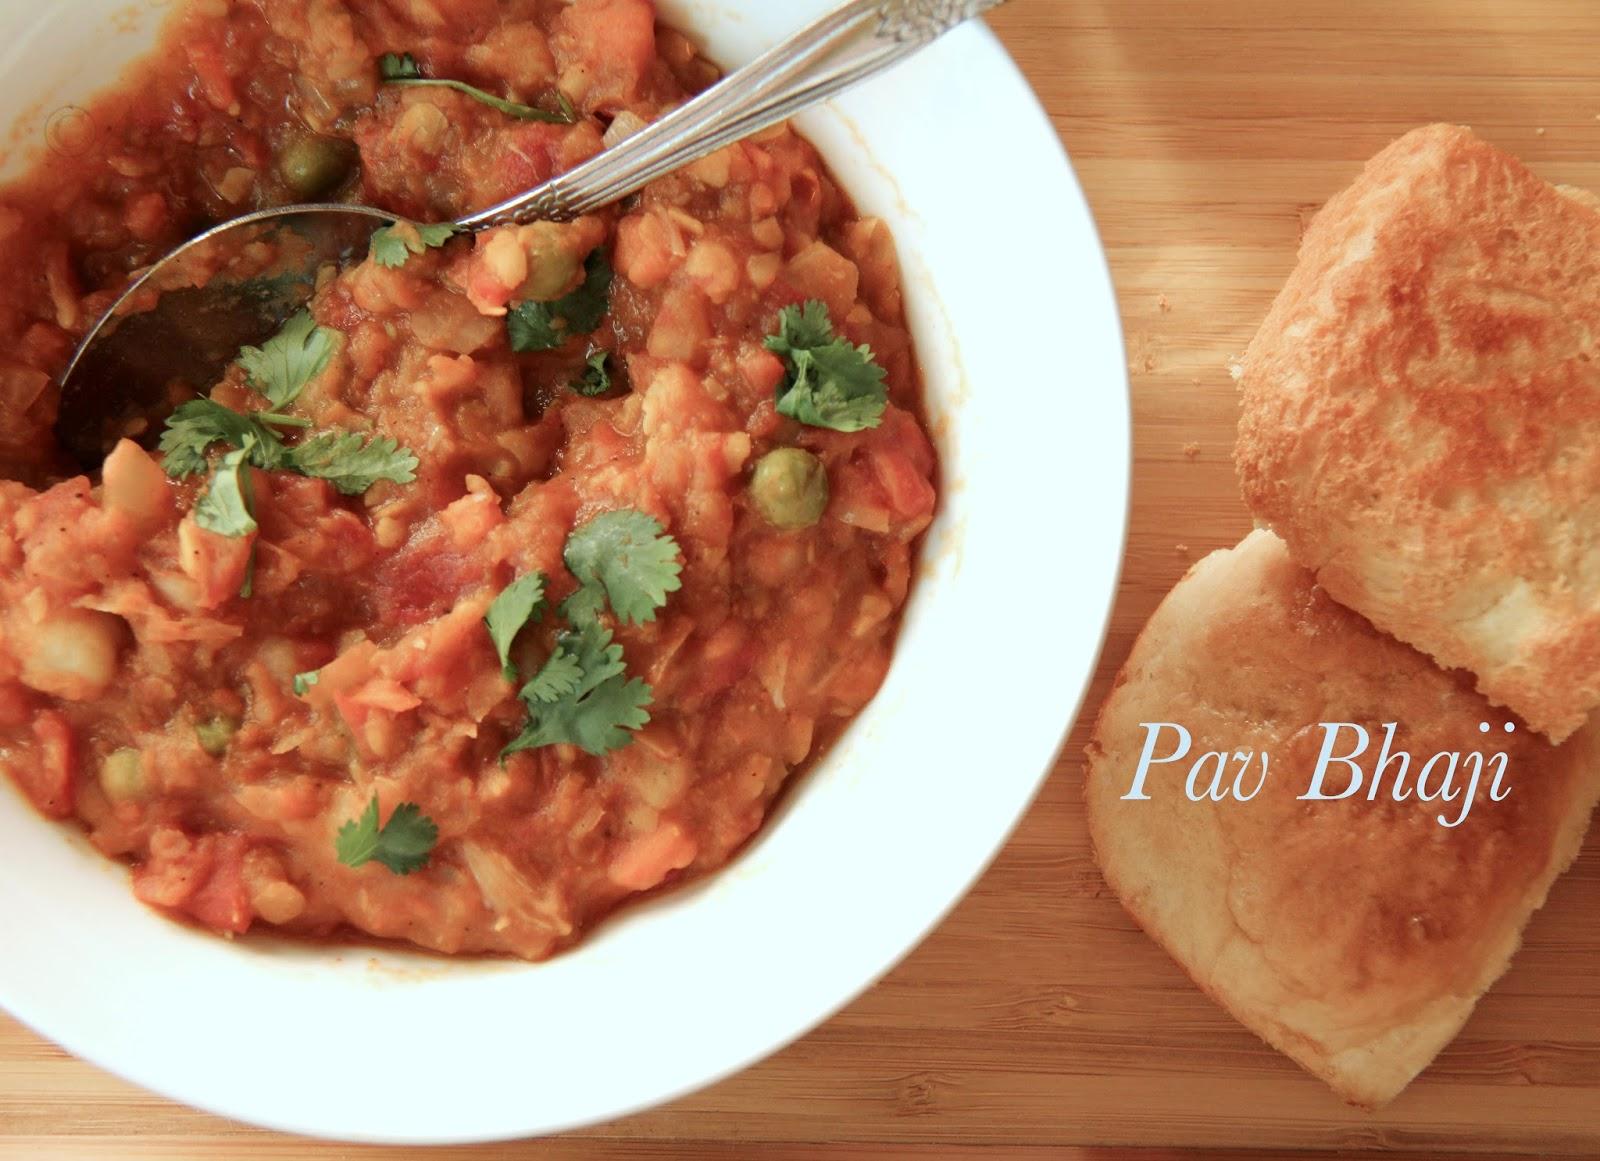 Pav bhaji how to make pav bhaji indian food recipes ammaji kitchen pav bhaji how to make pav bhaji forumfinder Image collections